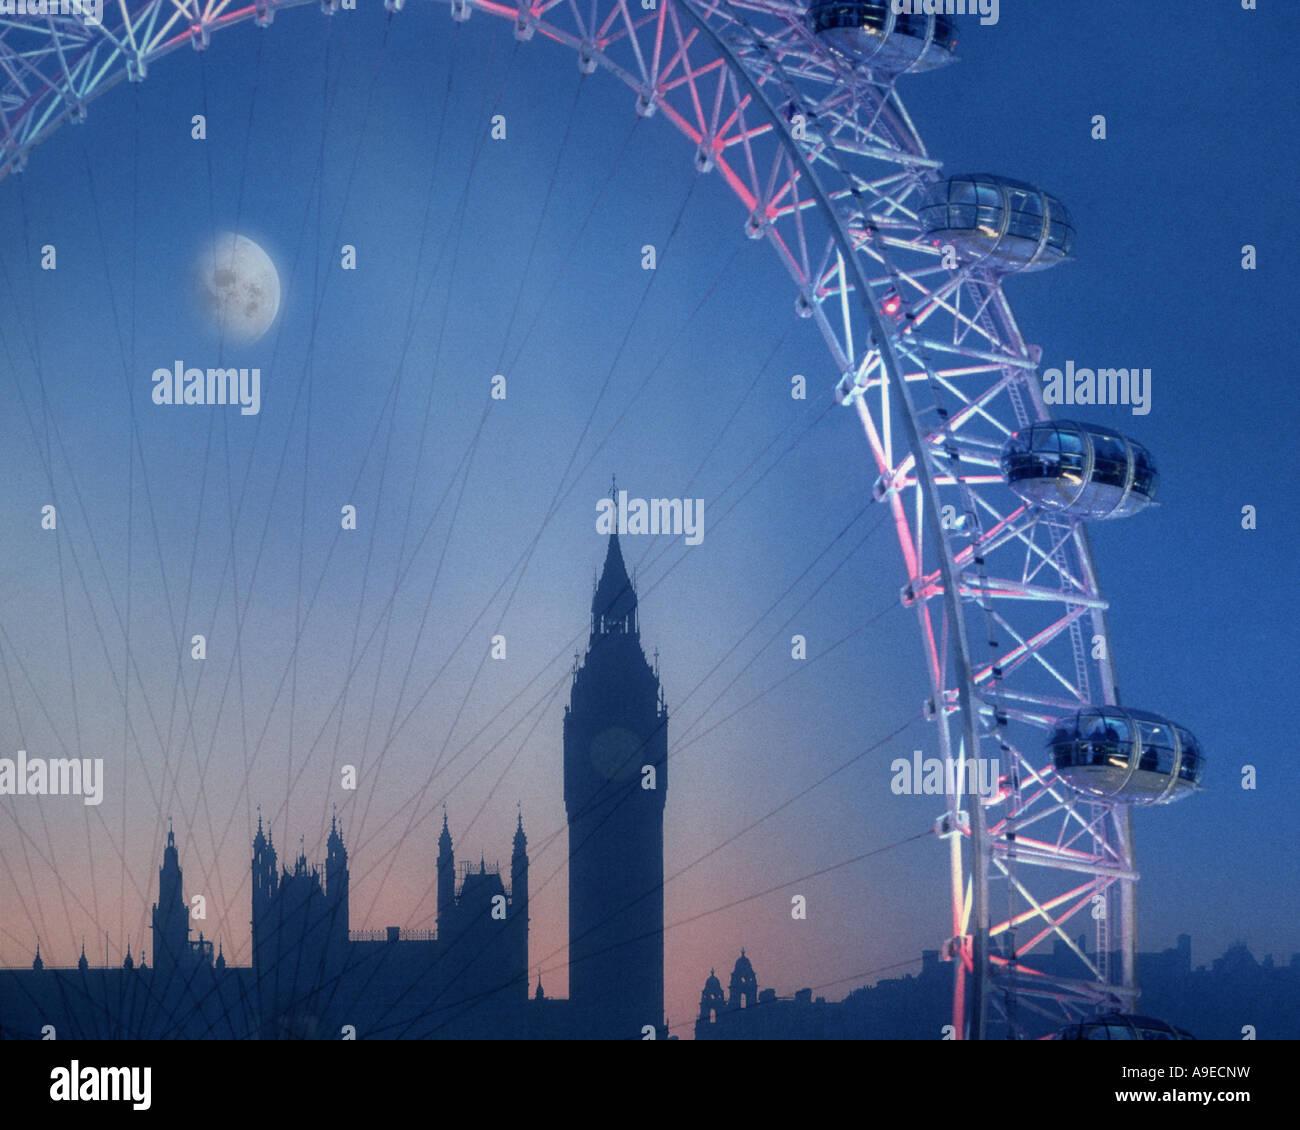 GB - LONDON:  The London Eye & Big Ben by night - Stock Image